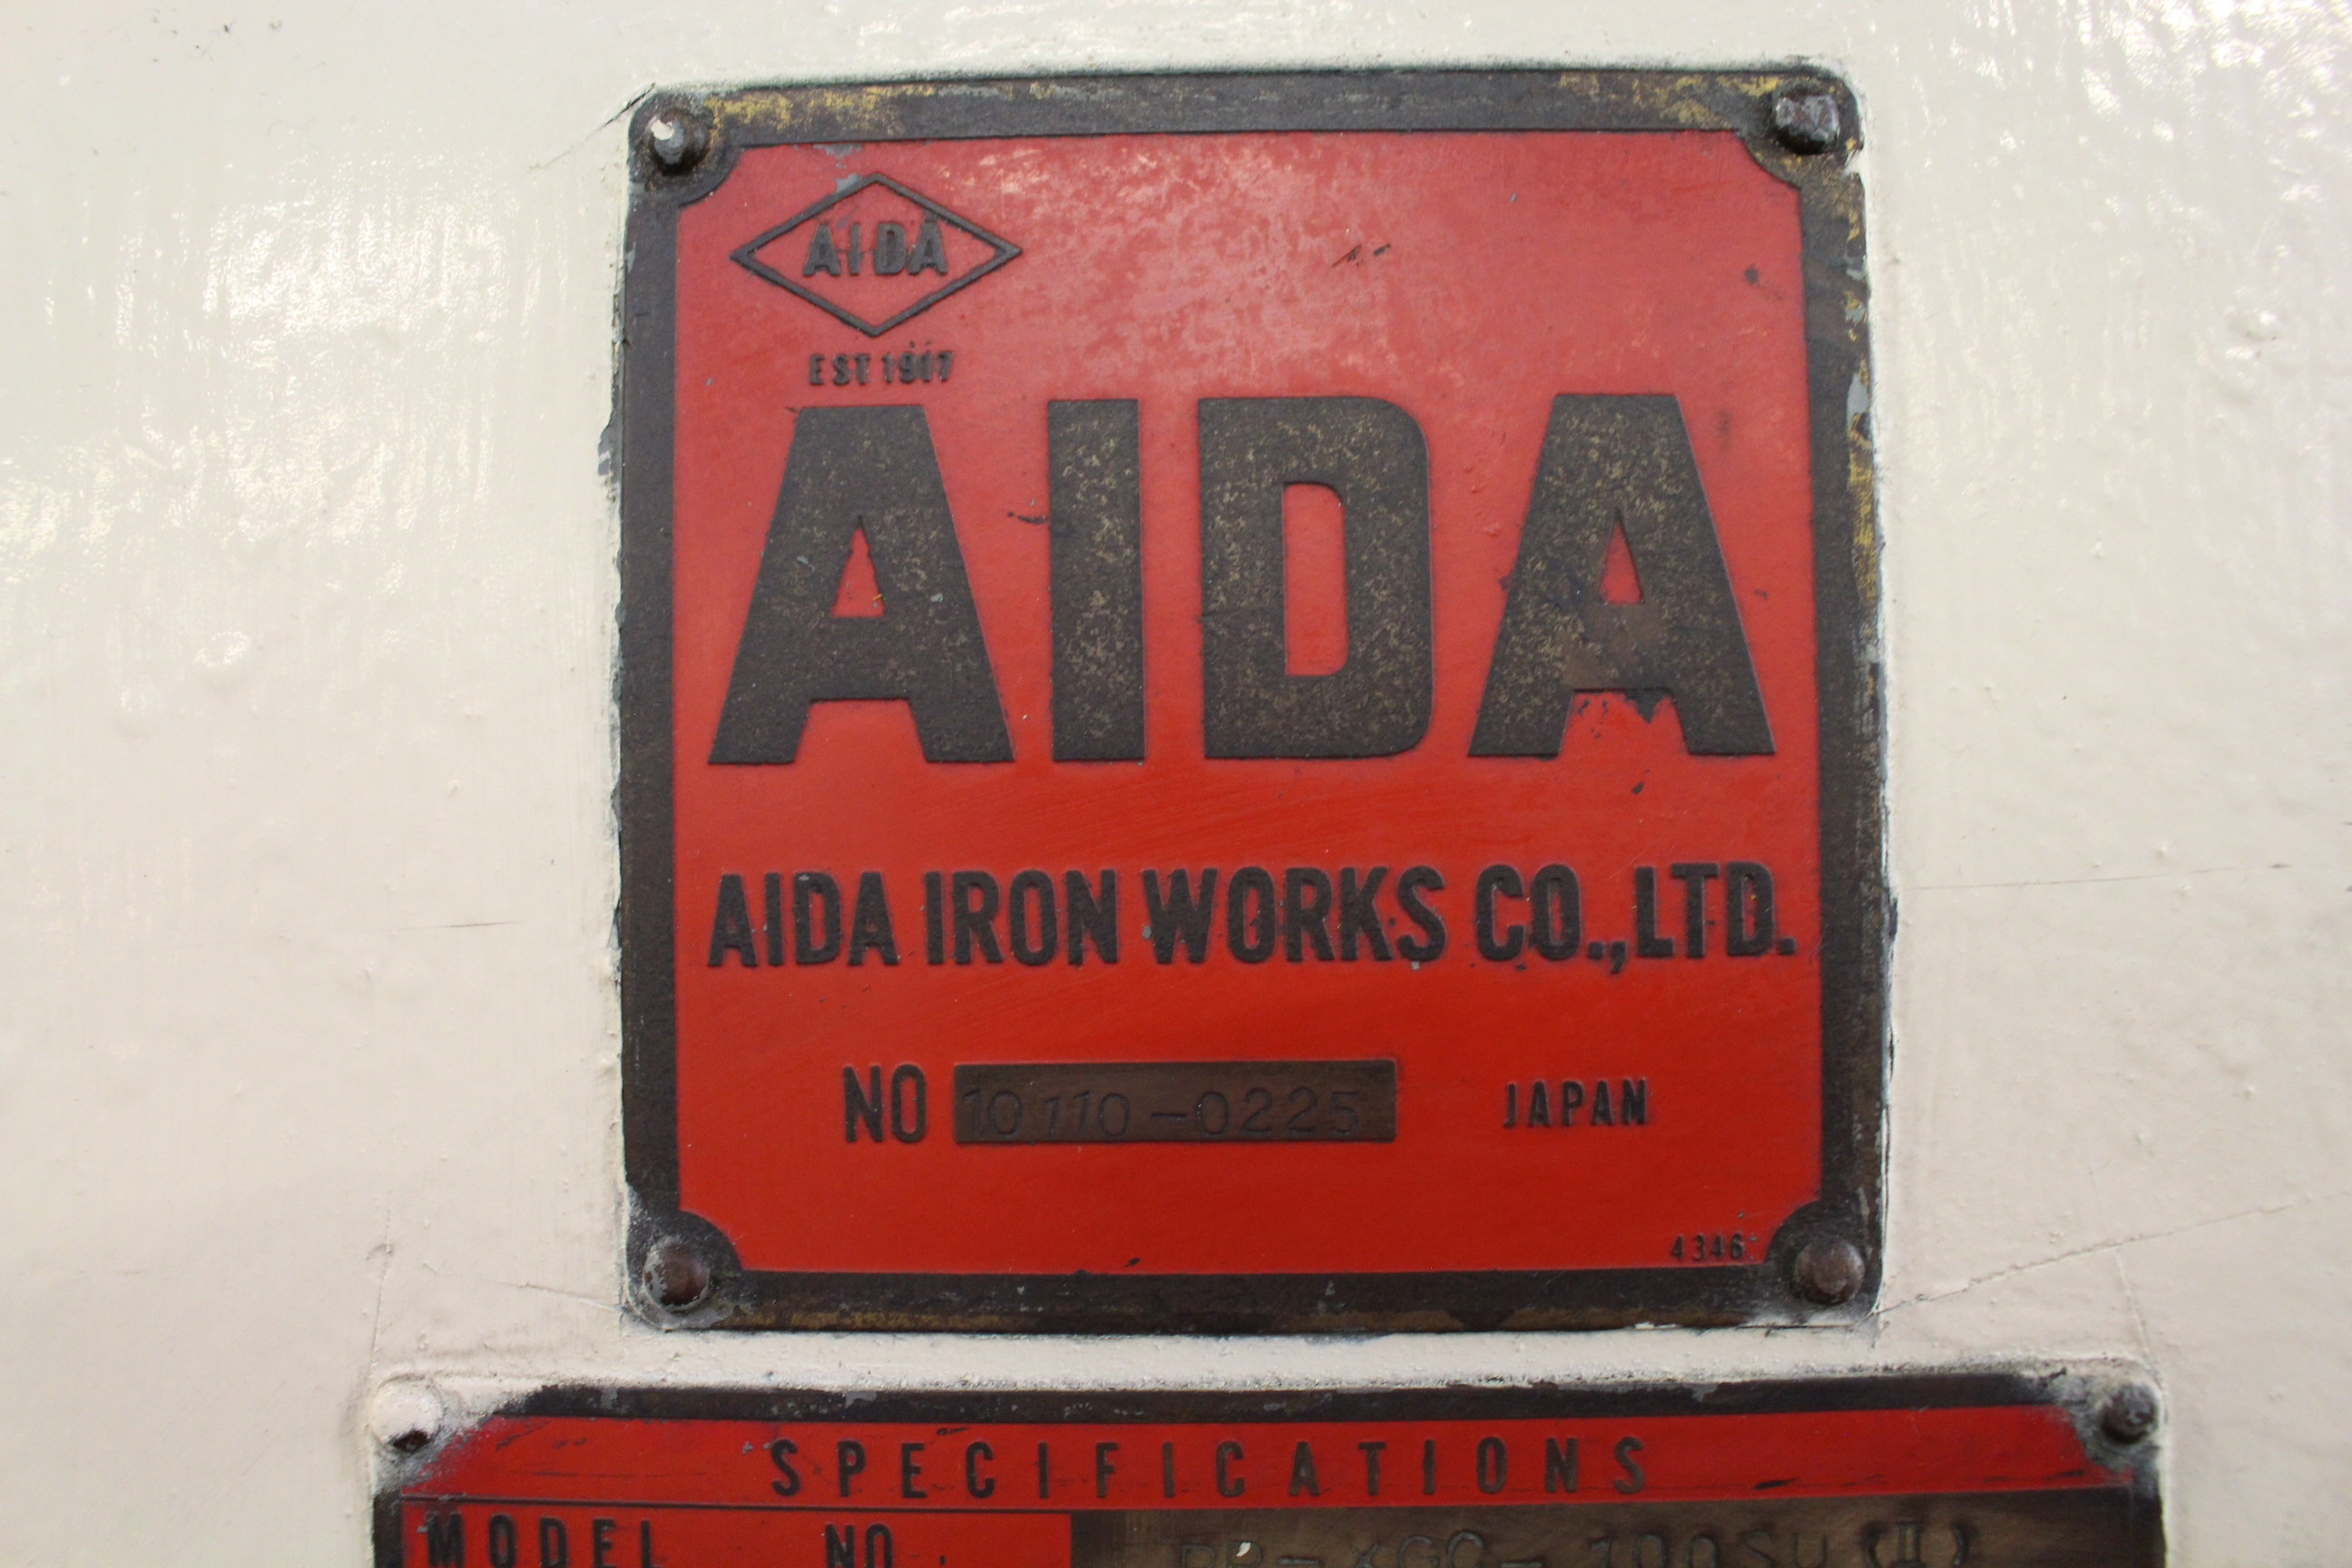 "AIDA MODEL PP-XG0-100SU (II) PUNCH PRESS, 100-TON CAPACITY, 6.6"" STROKE, 50 SPM, 41.7"" X 22"" - Image 8 of 9"